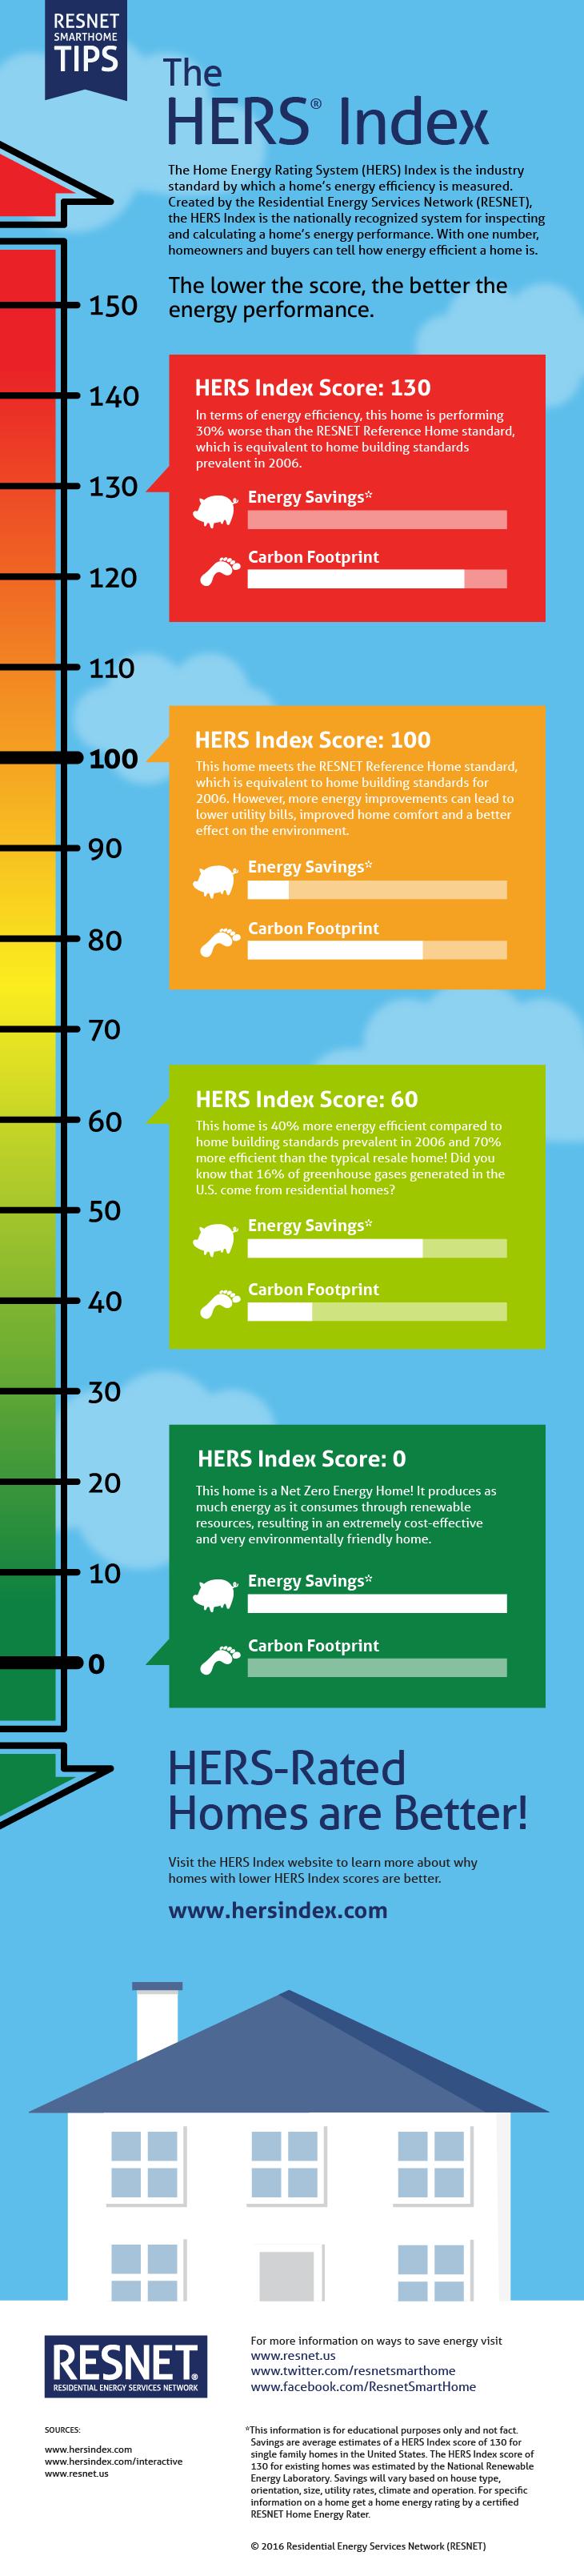 RESNET Infographic